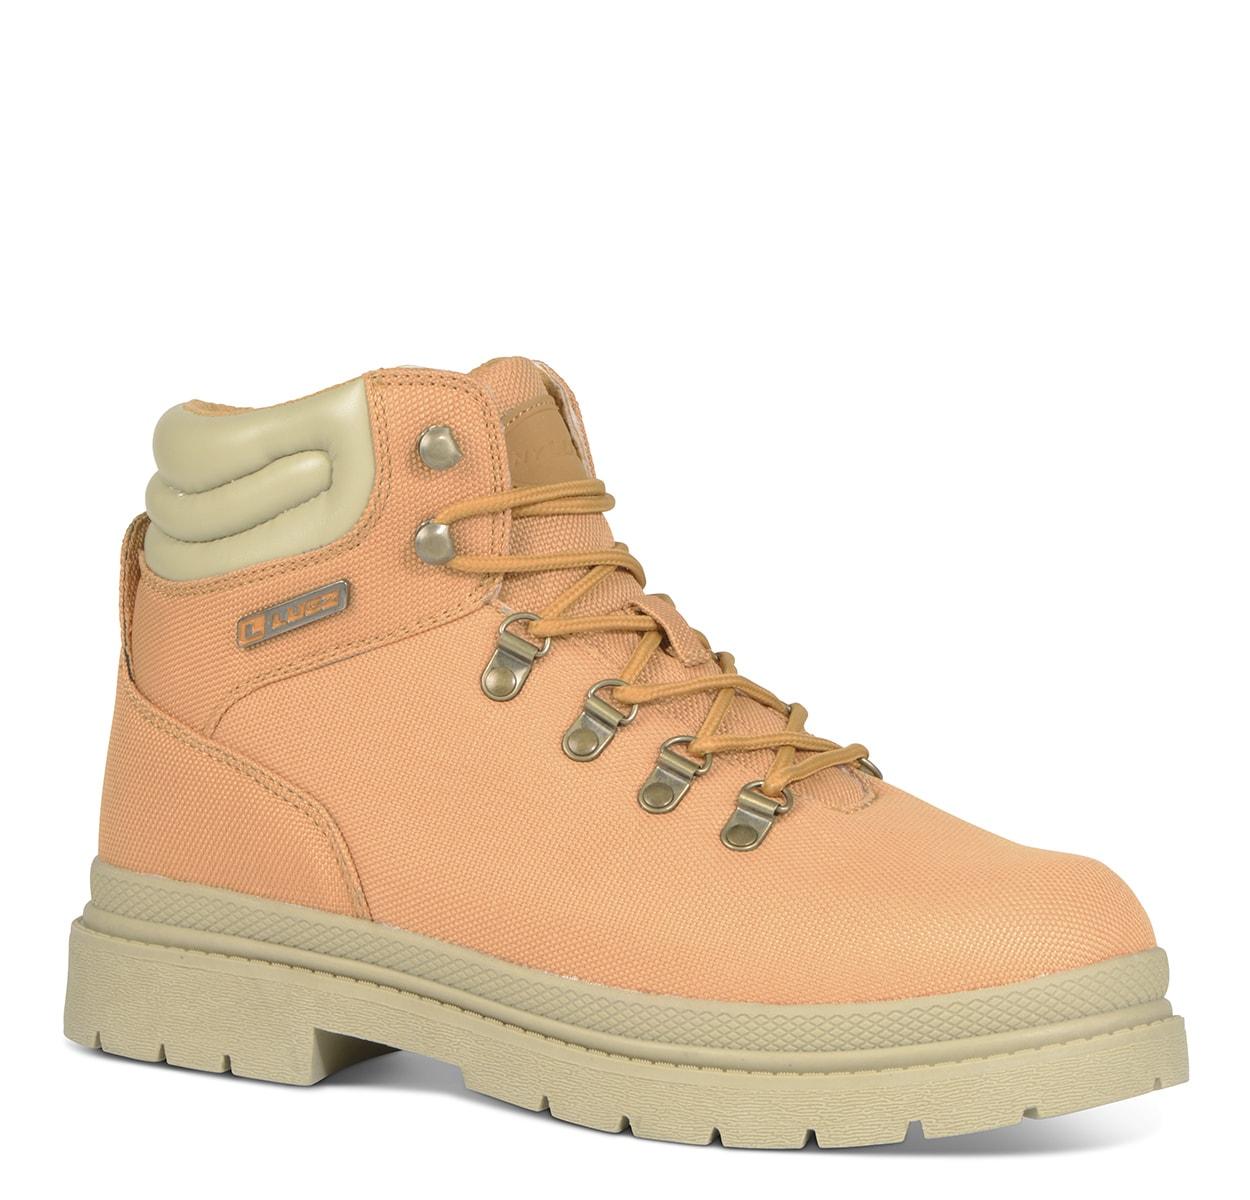 Men's Grotto Ballistic Chukka Boot (Choose Your Color: Golden Wheat/Cream, Choose Your Size: 9.0)